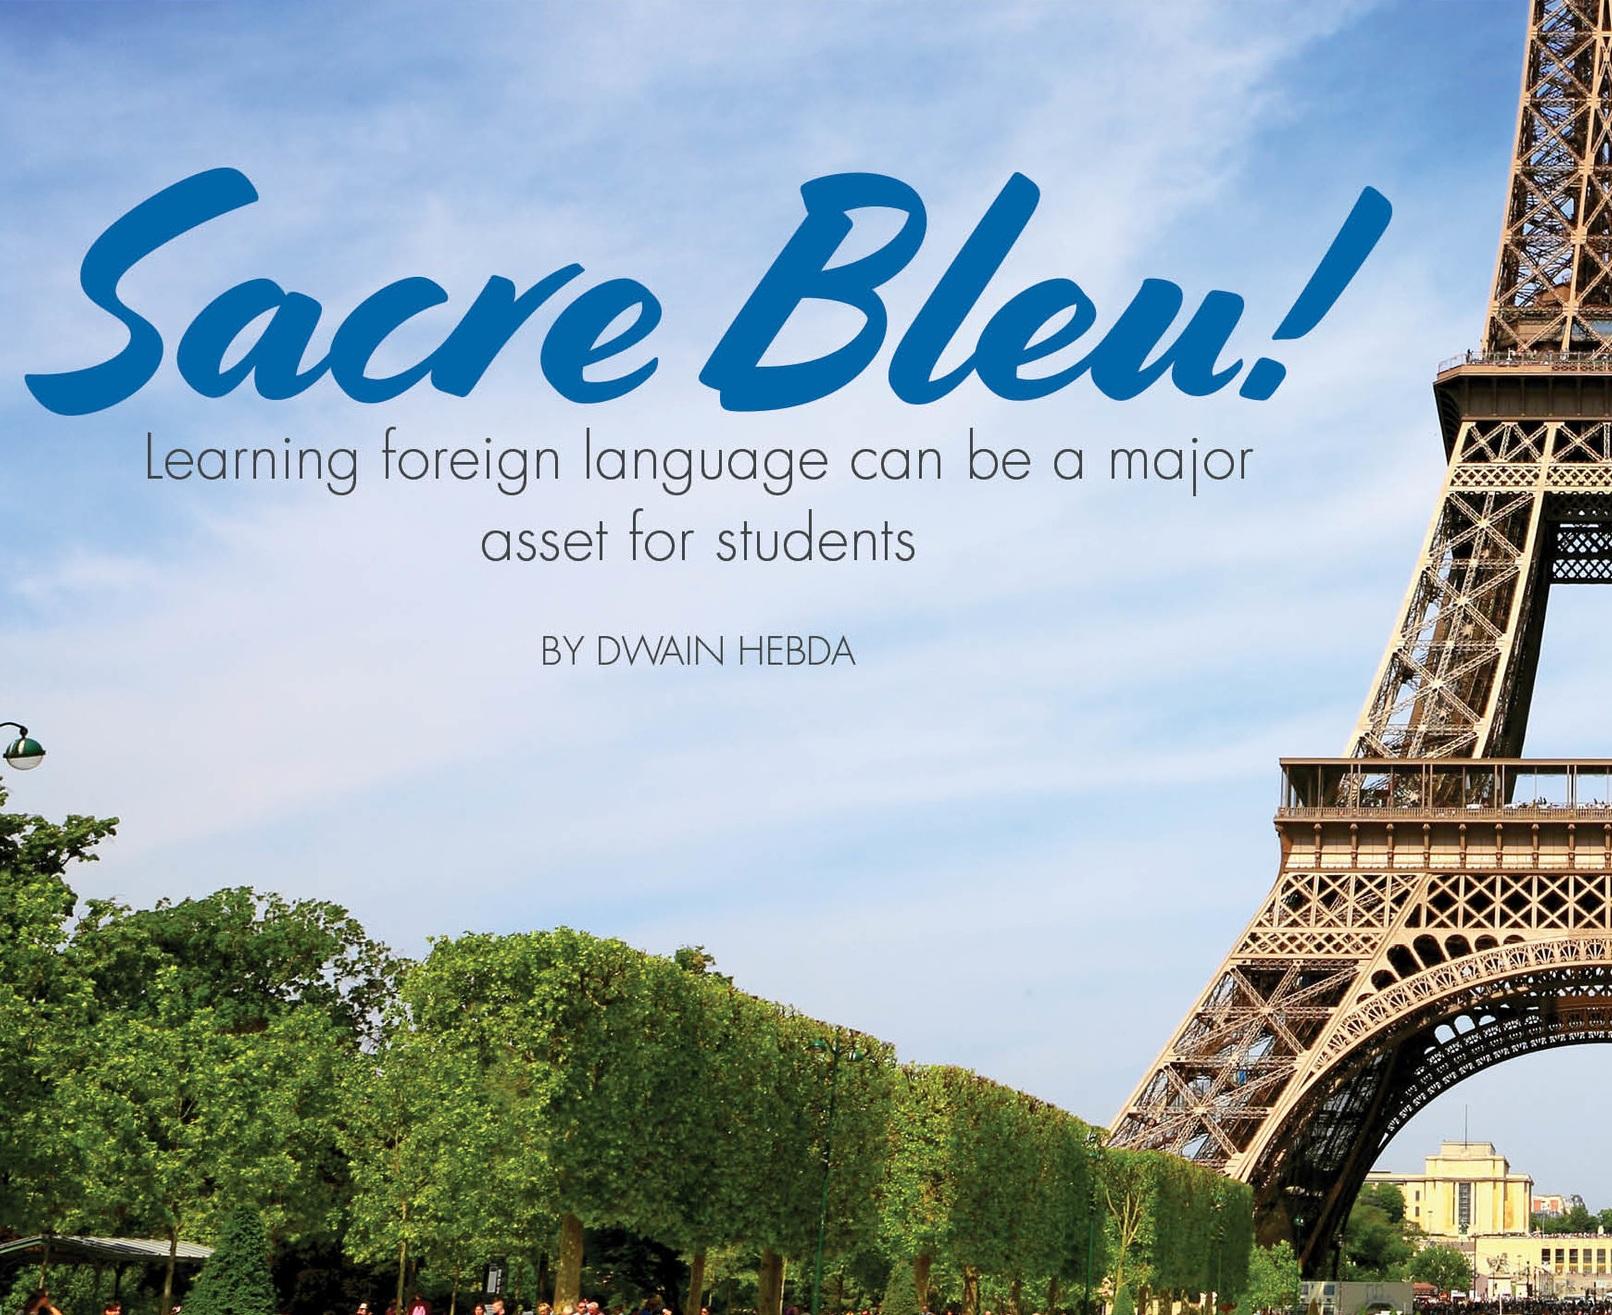 Sacre Bleu!   L earning foreign language